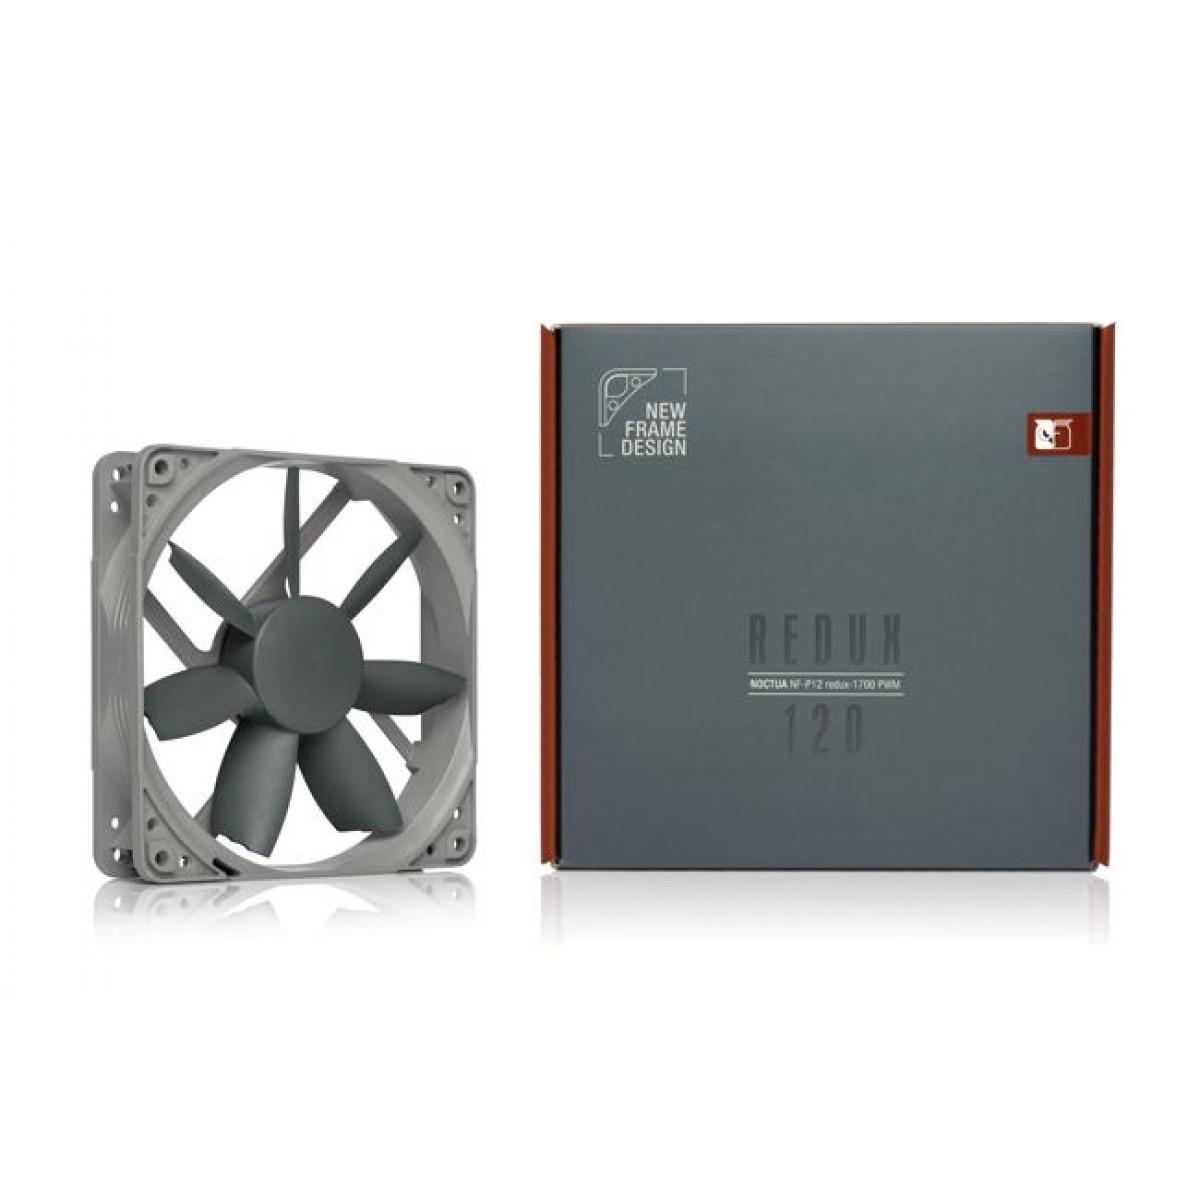 Cooler para Gabinete Noctua NF-S12B redux-1200 PWM, Gray, 120mm, NF-S12B redux-1200 PWM